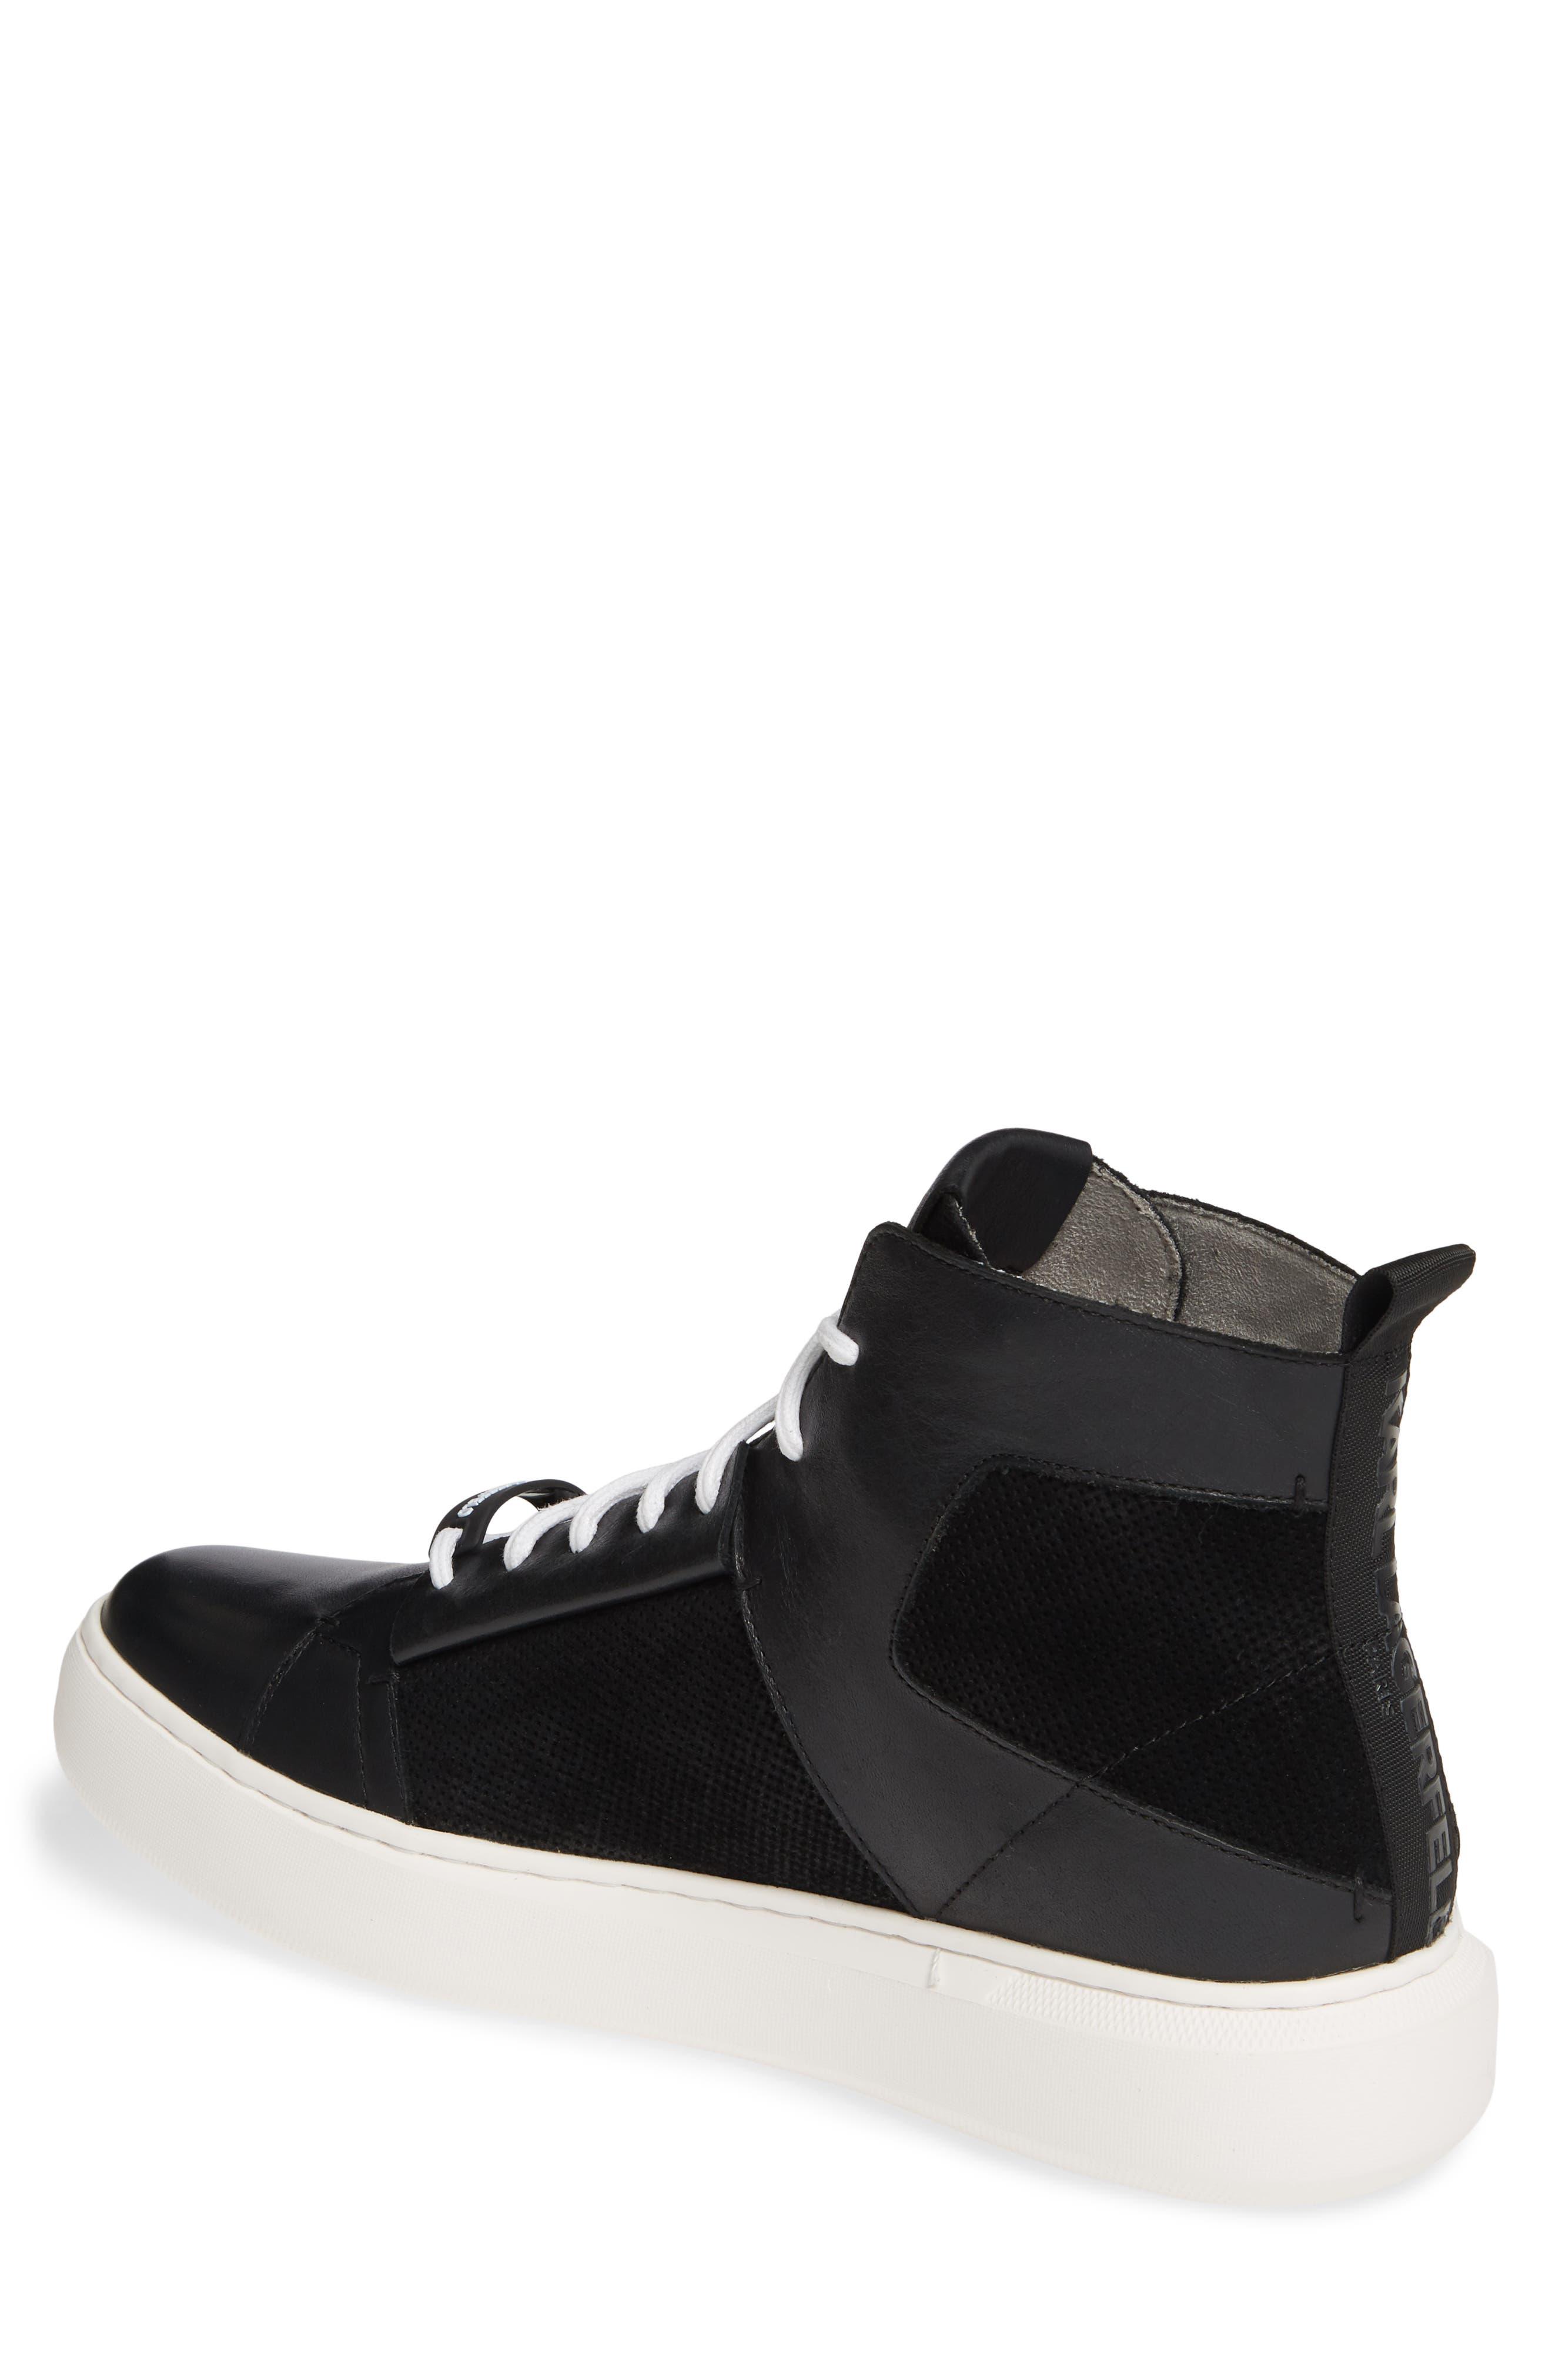 KARL LAGERFELD PARIS, High Top Sneaker, Alternate thumbnail 2, color, BLACK LEATHER